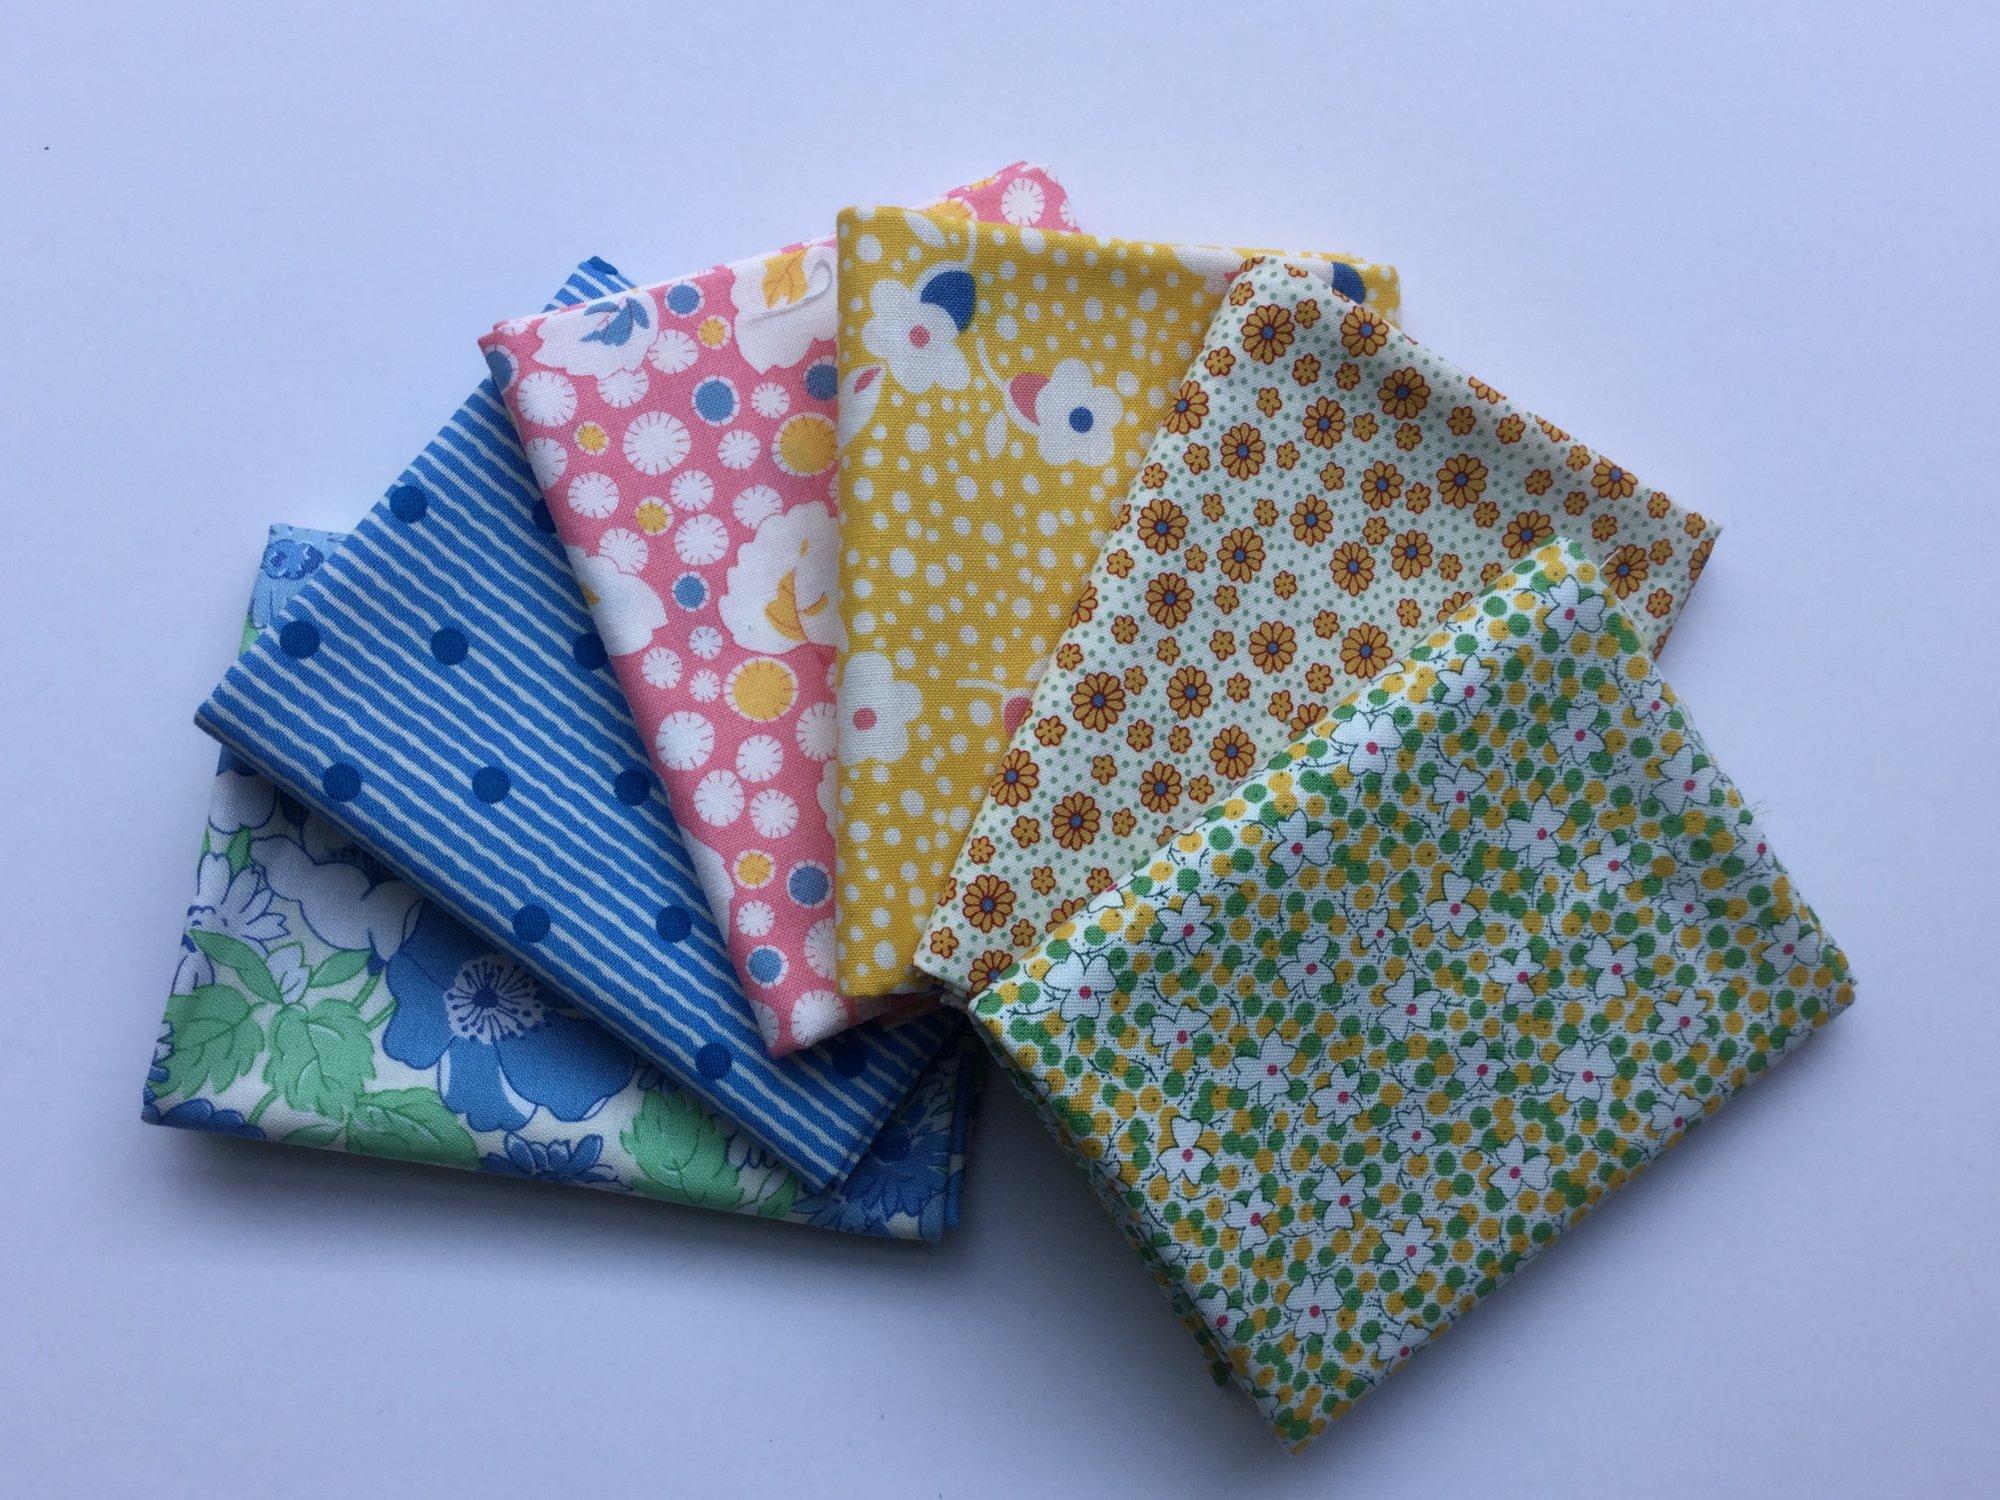 Fat Quarter Bundle - Reproduction Civil War fabrics  - Large Mixed Bundle of 10